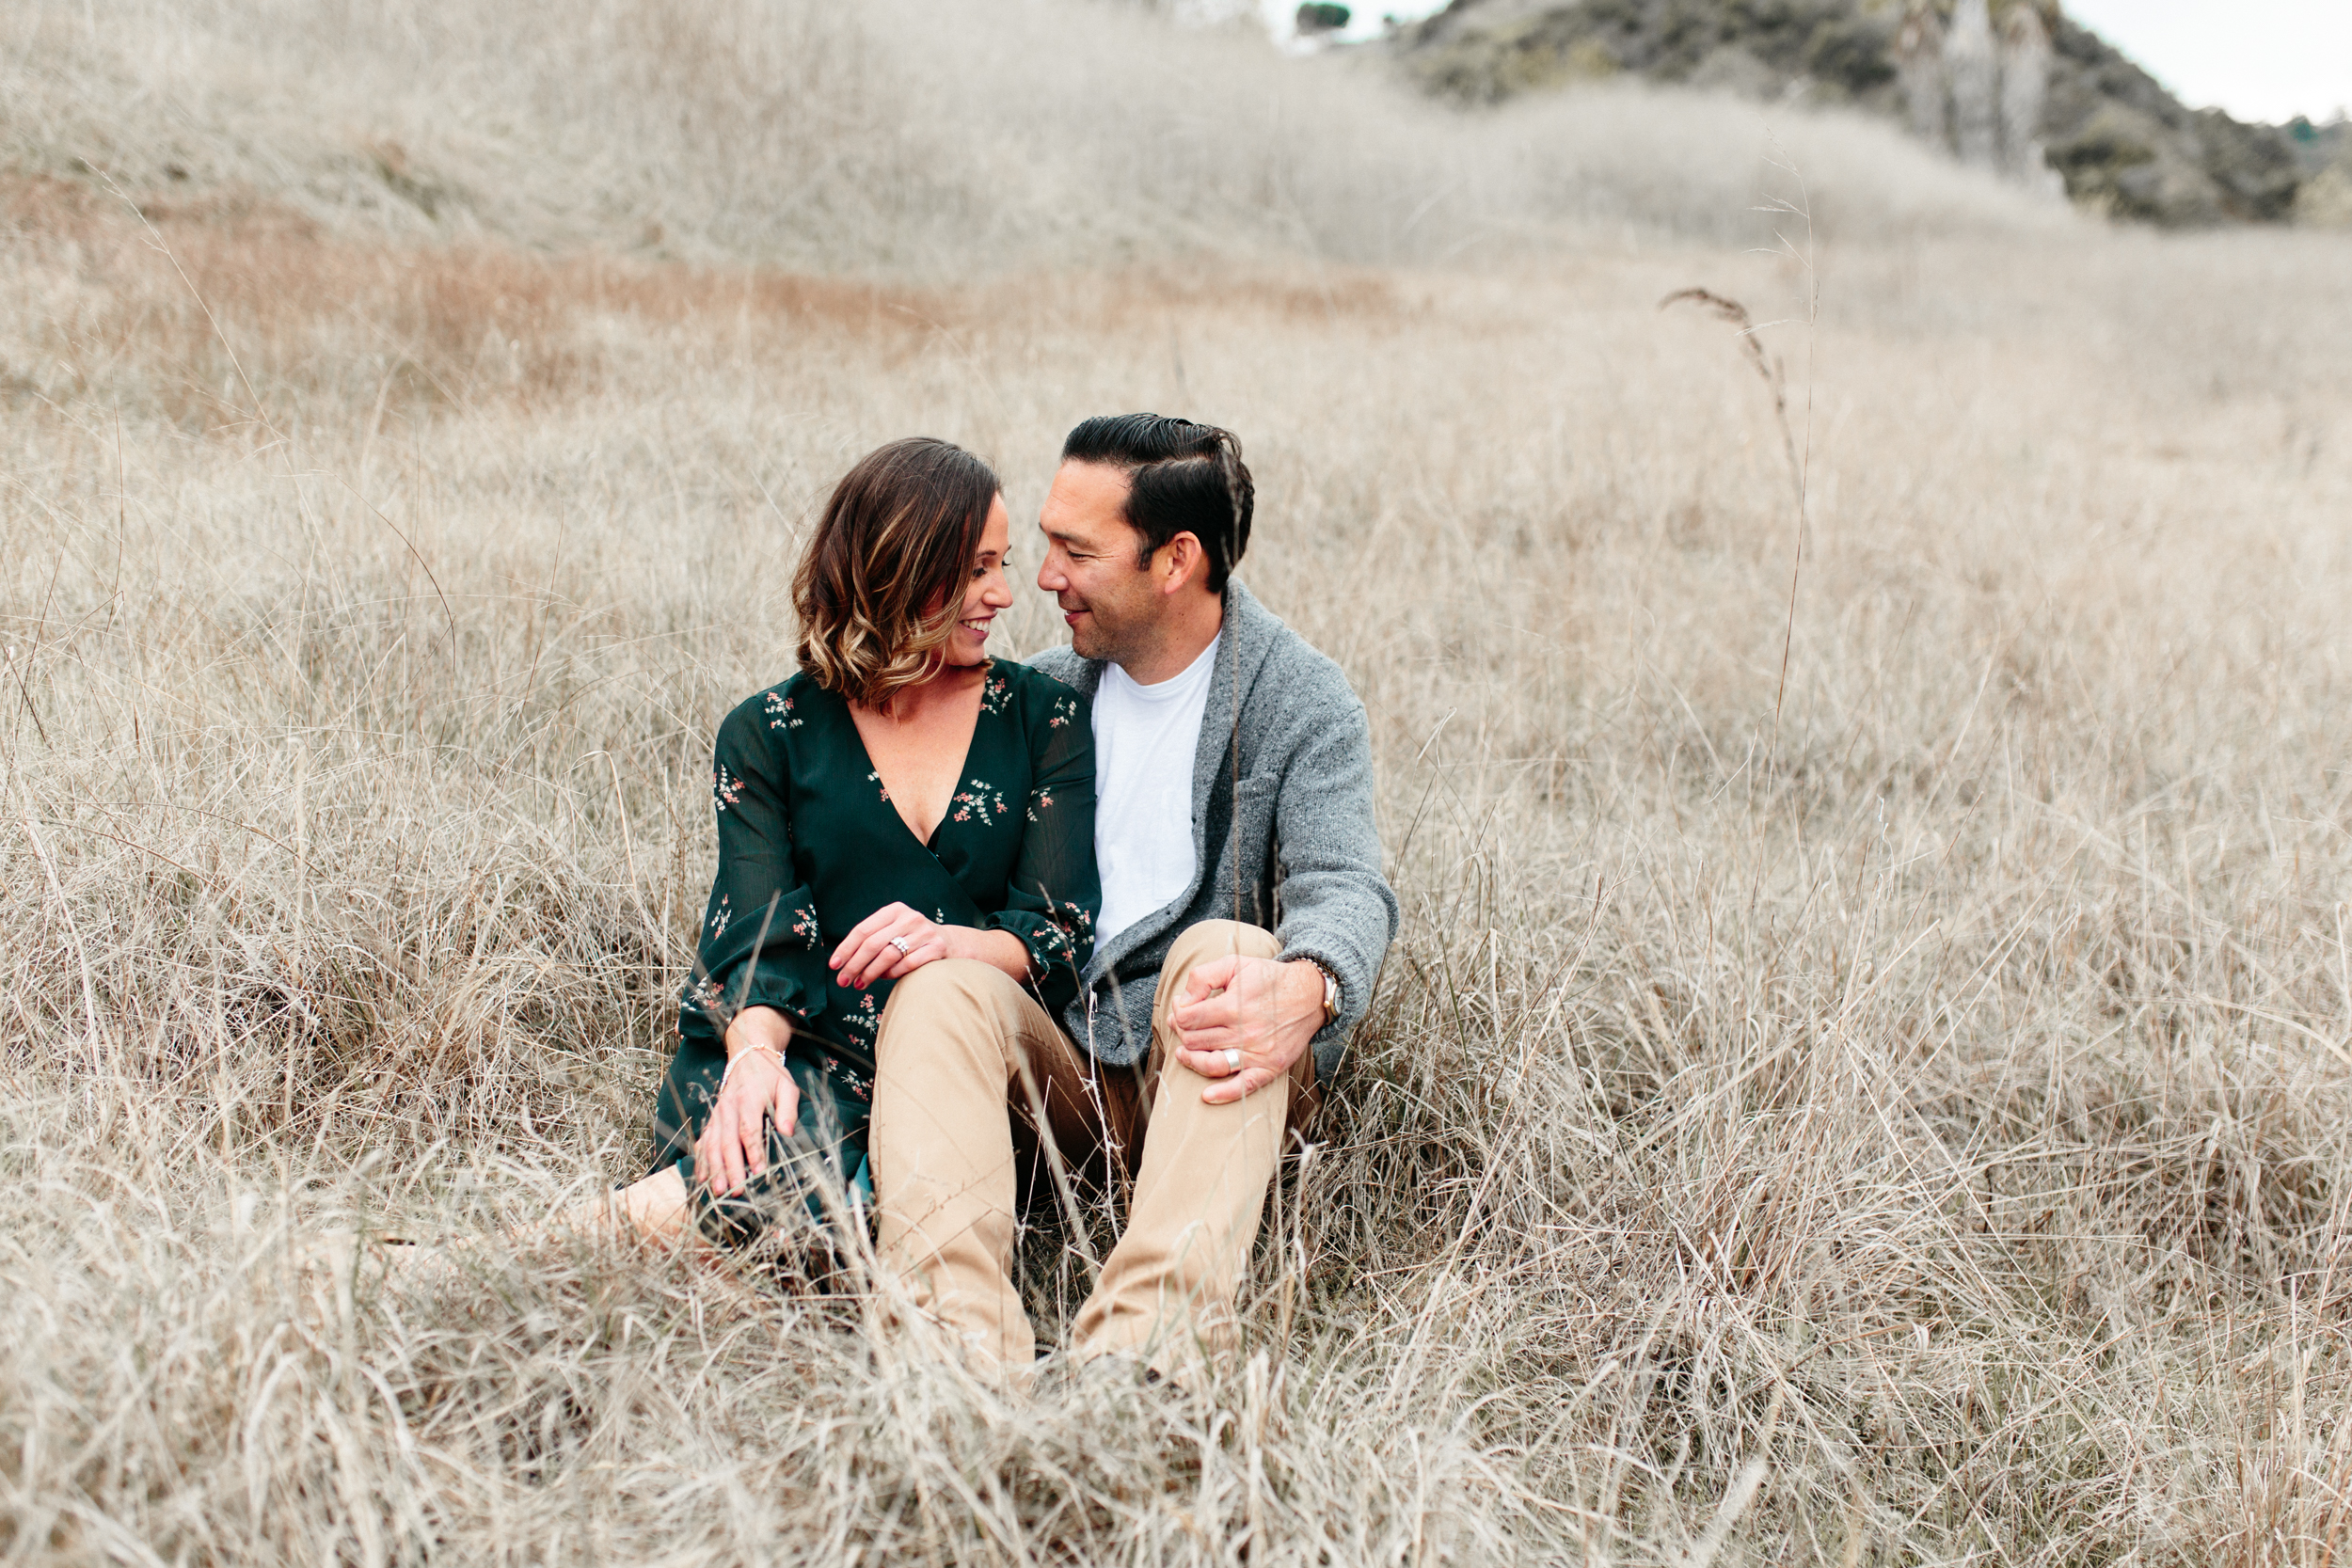 SamErica Studios - San Diego Photographer - Destination Wedding Photographer-36.jpg